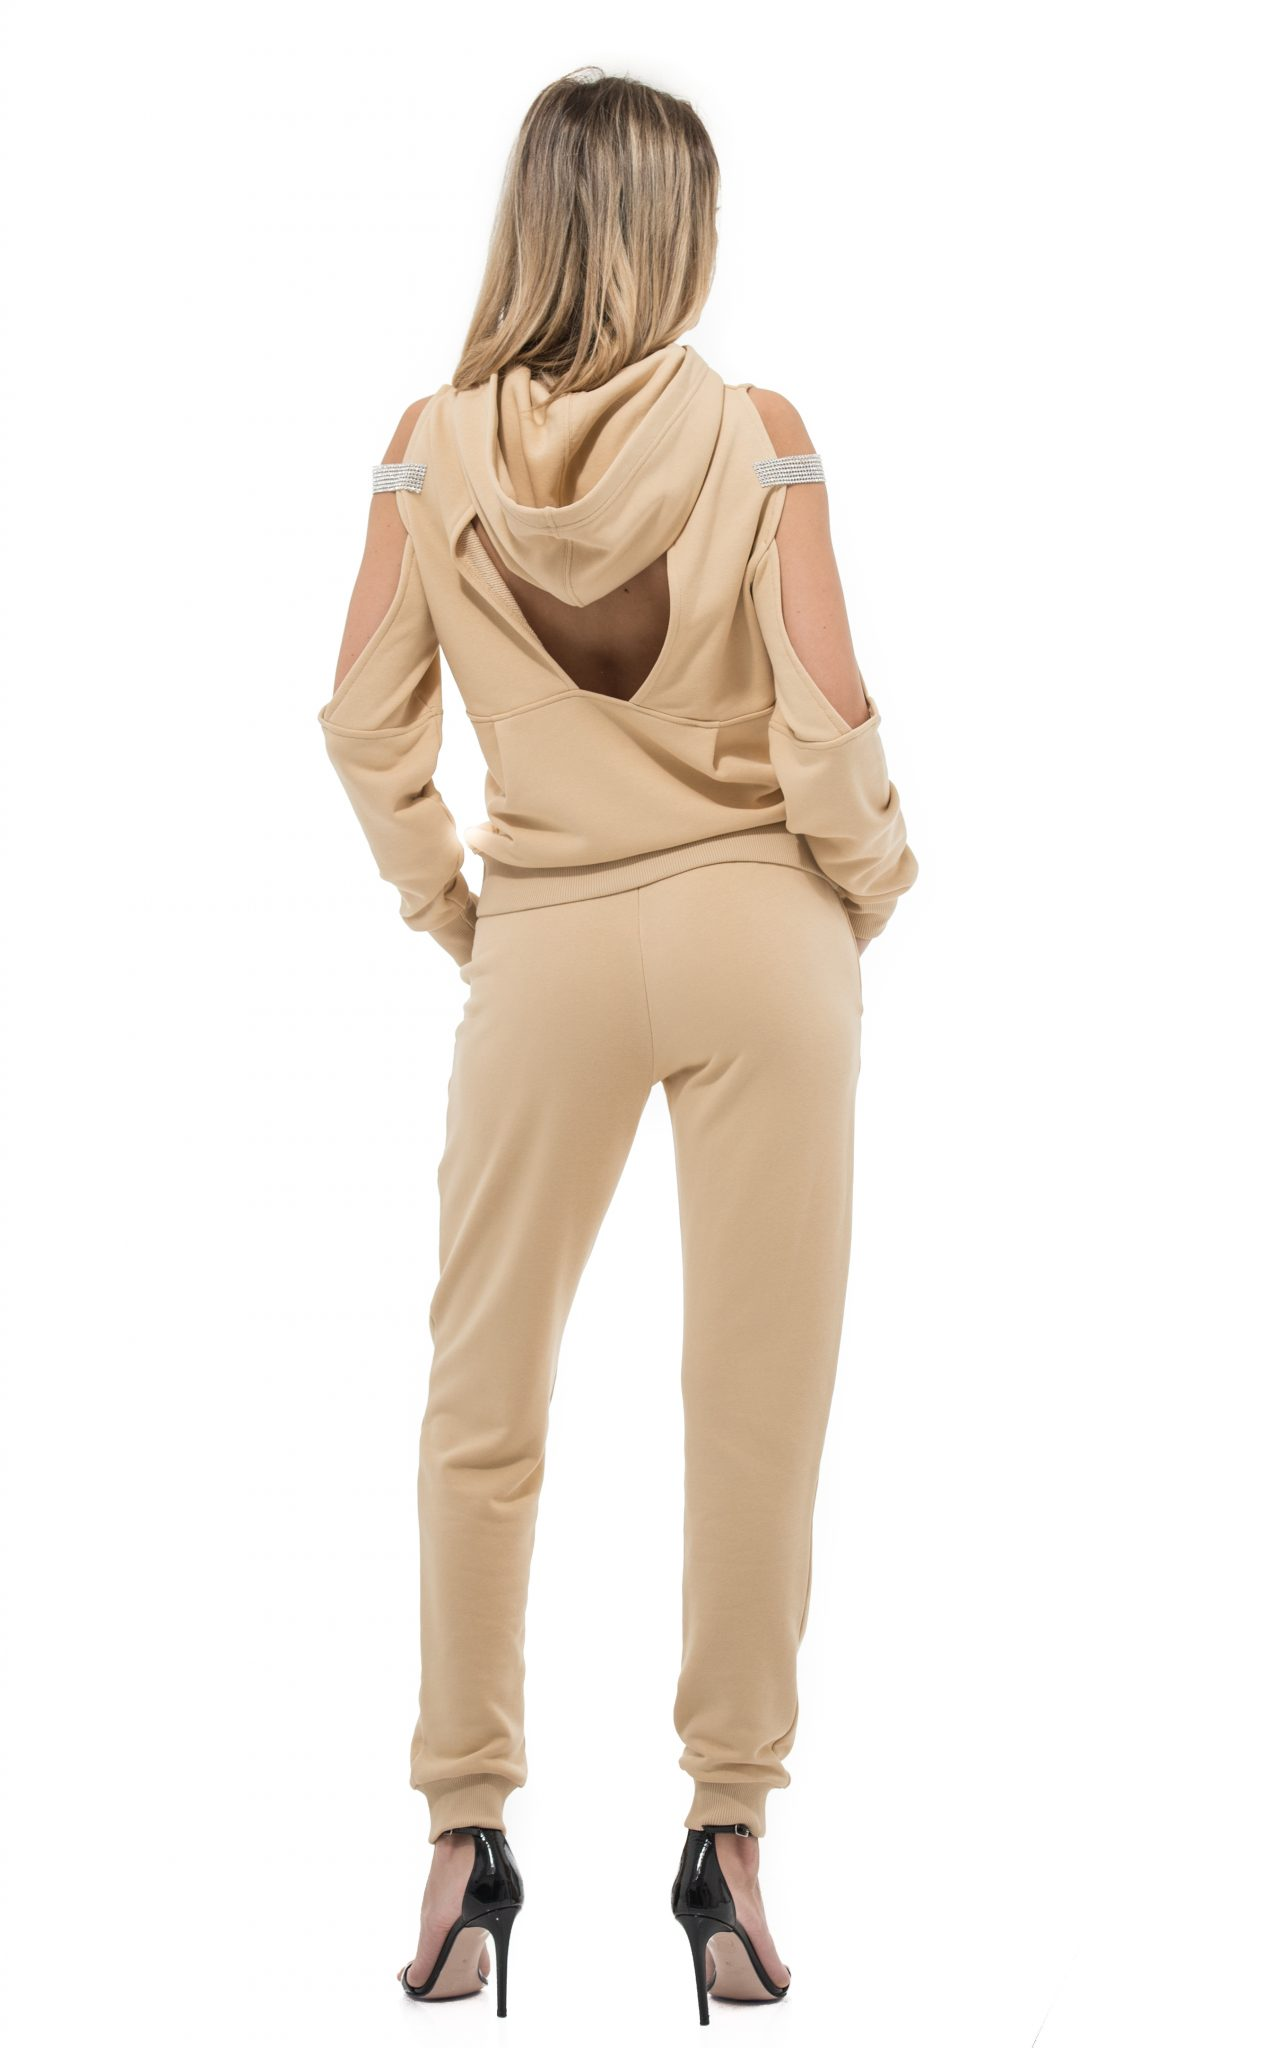 Pantalon MELBA BEIGE (2) POZA PRIMARA